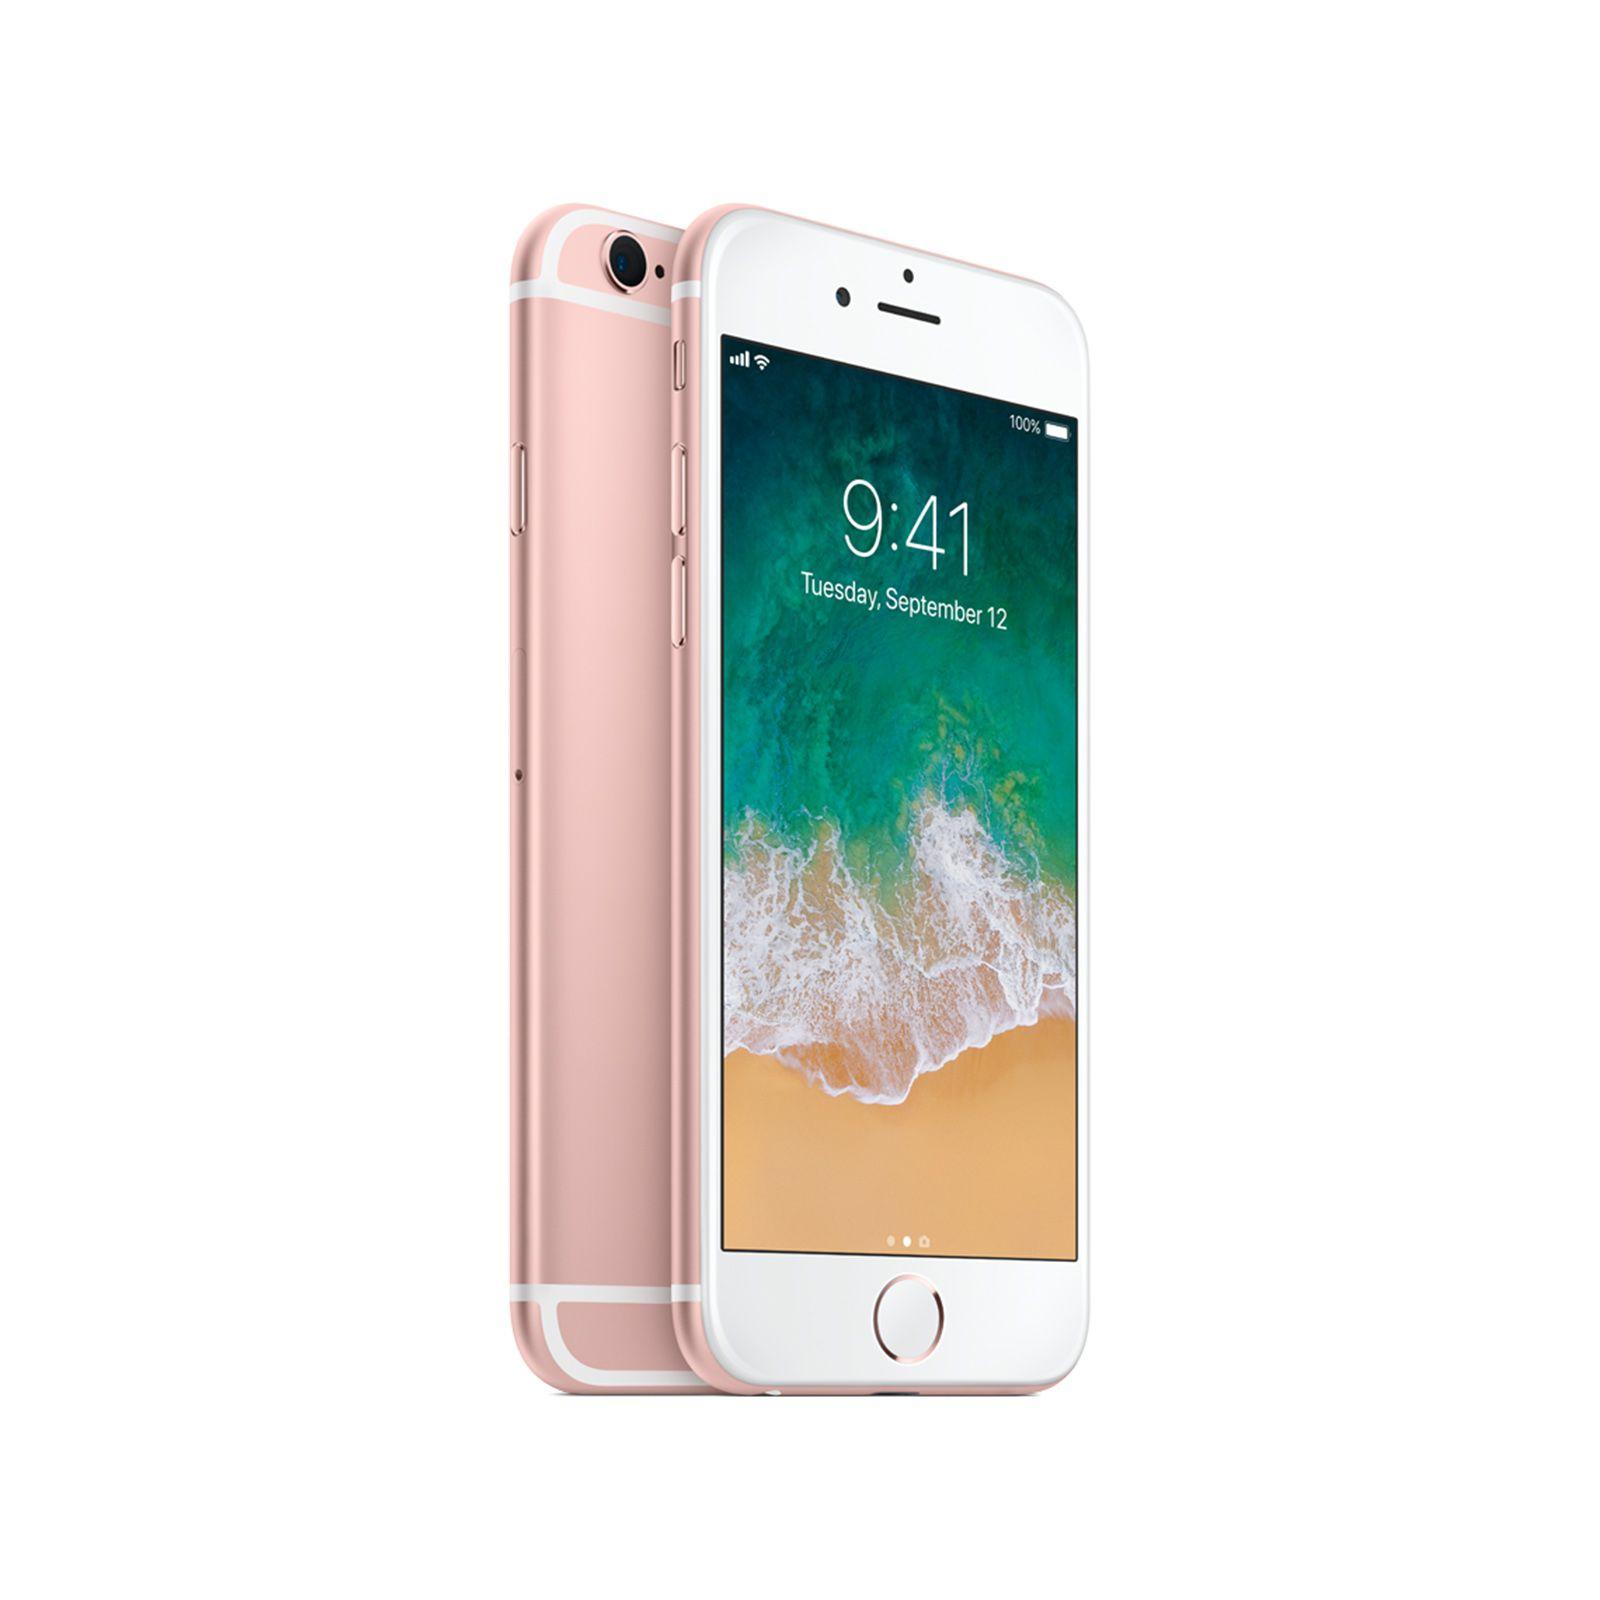 Iphone 6s 32GB Apple Gold Rose